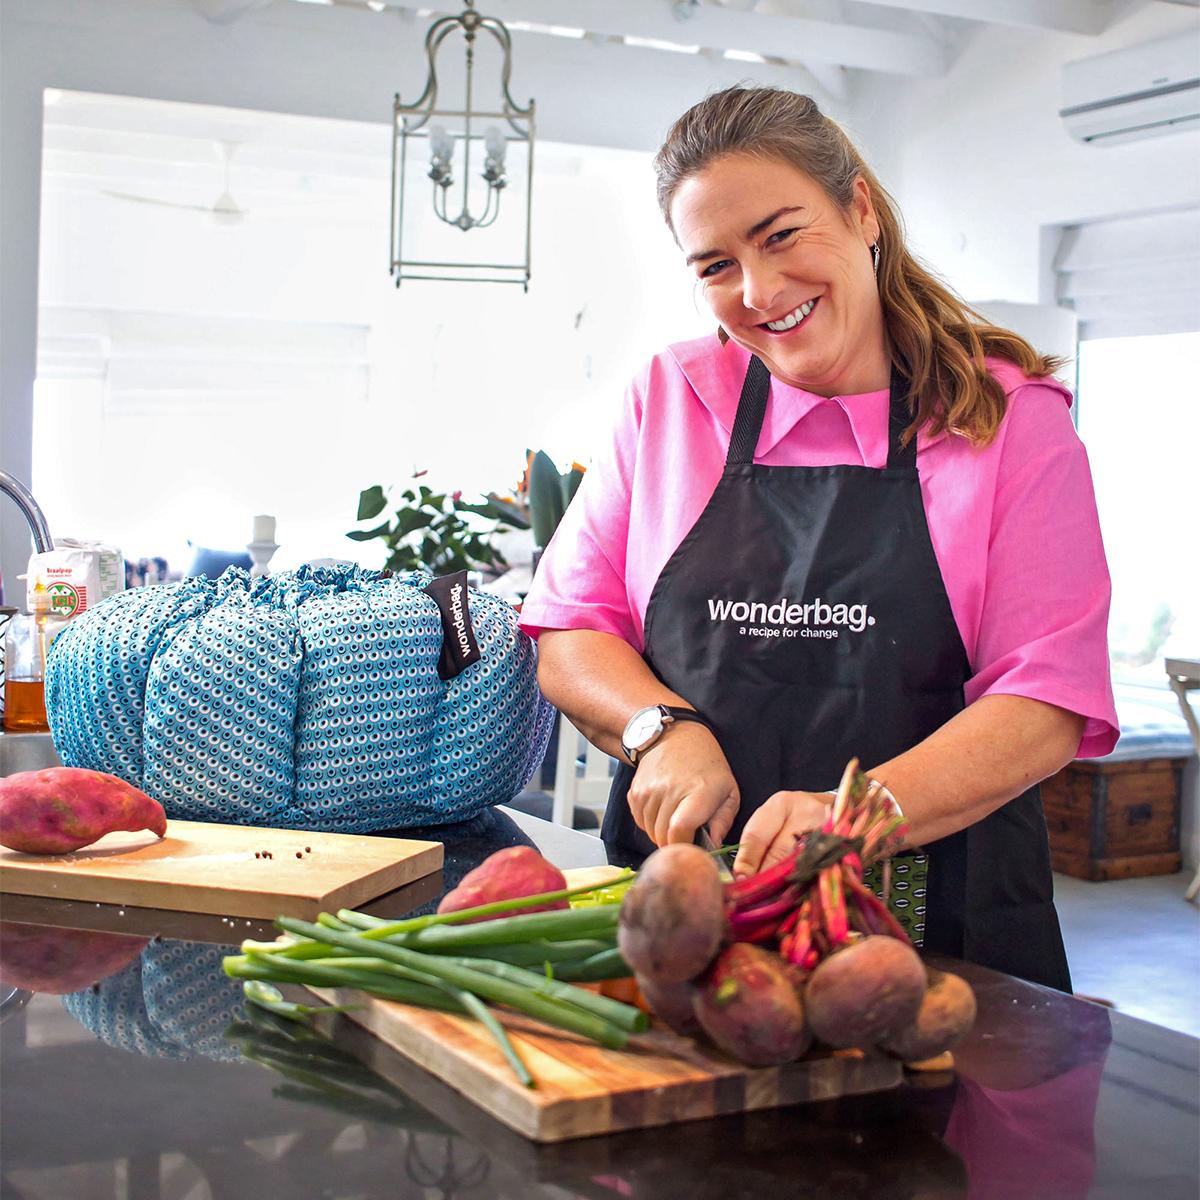 Sarah Collins with wonderbag slicing vegetables